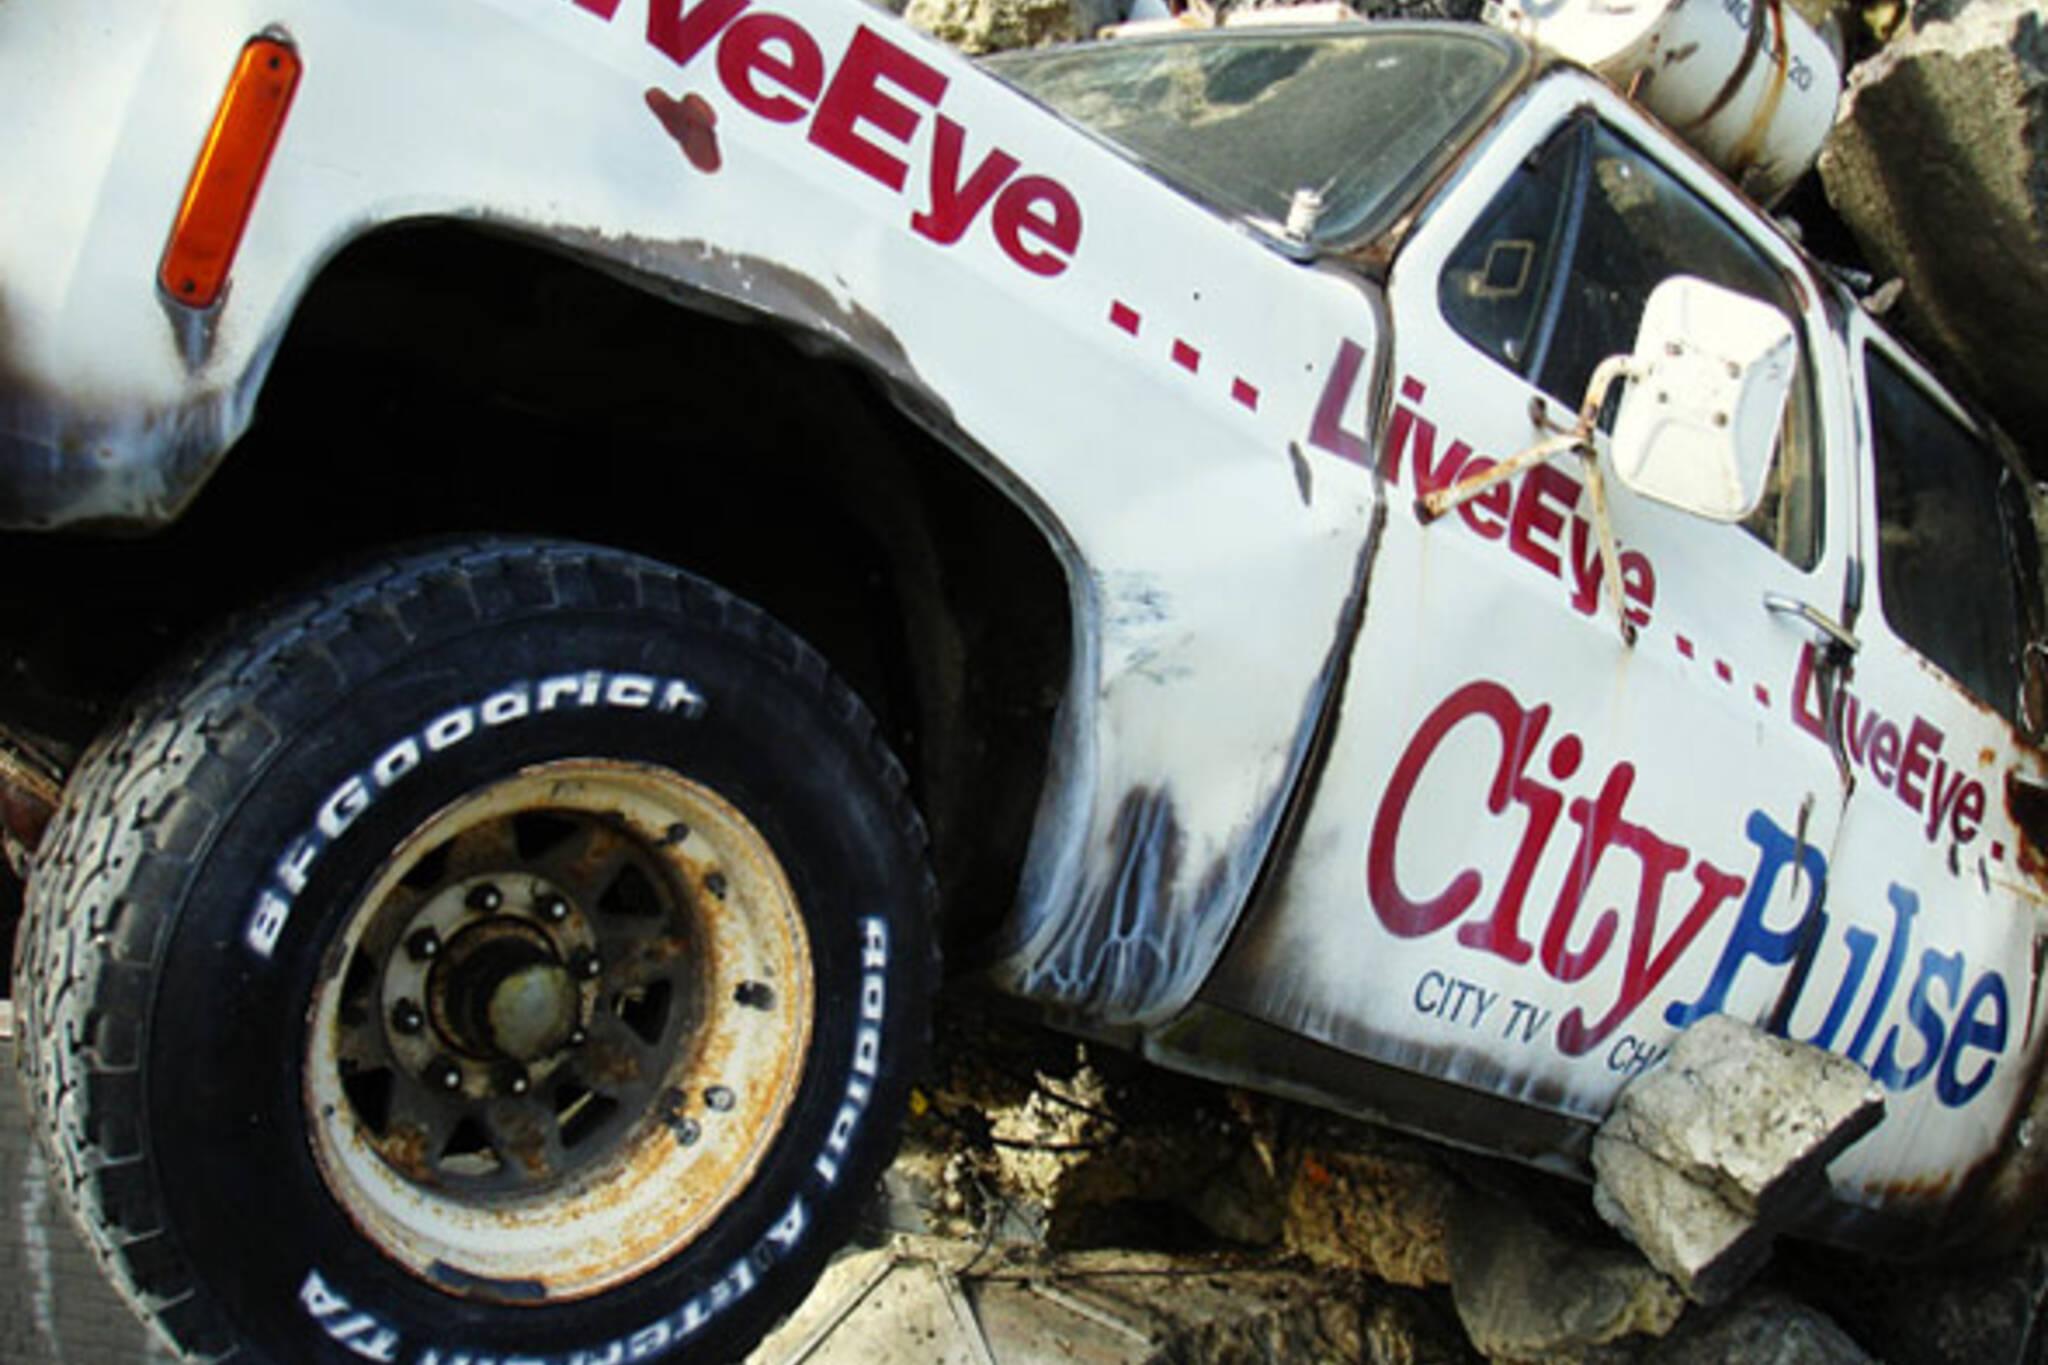 citytv news history